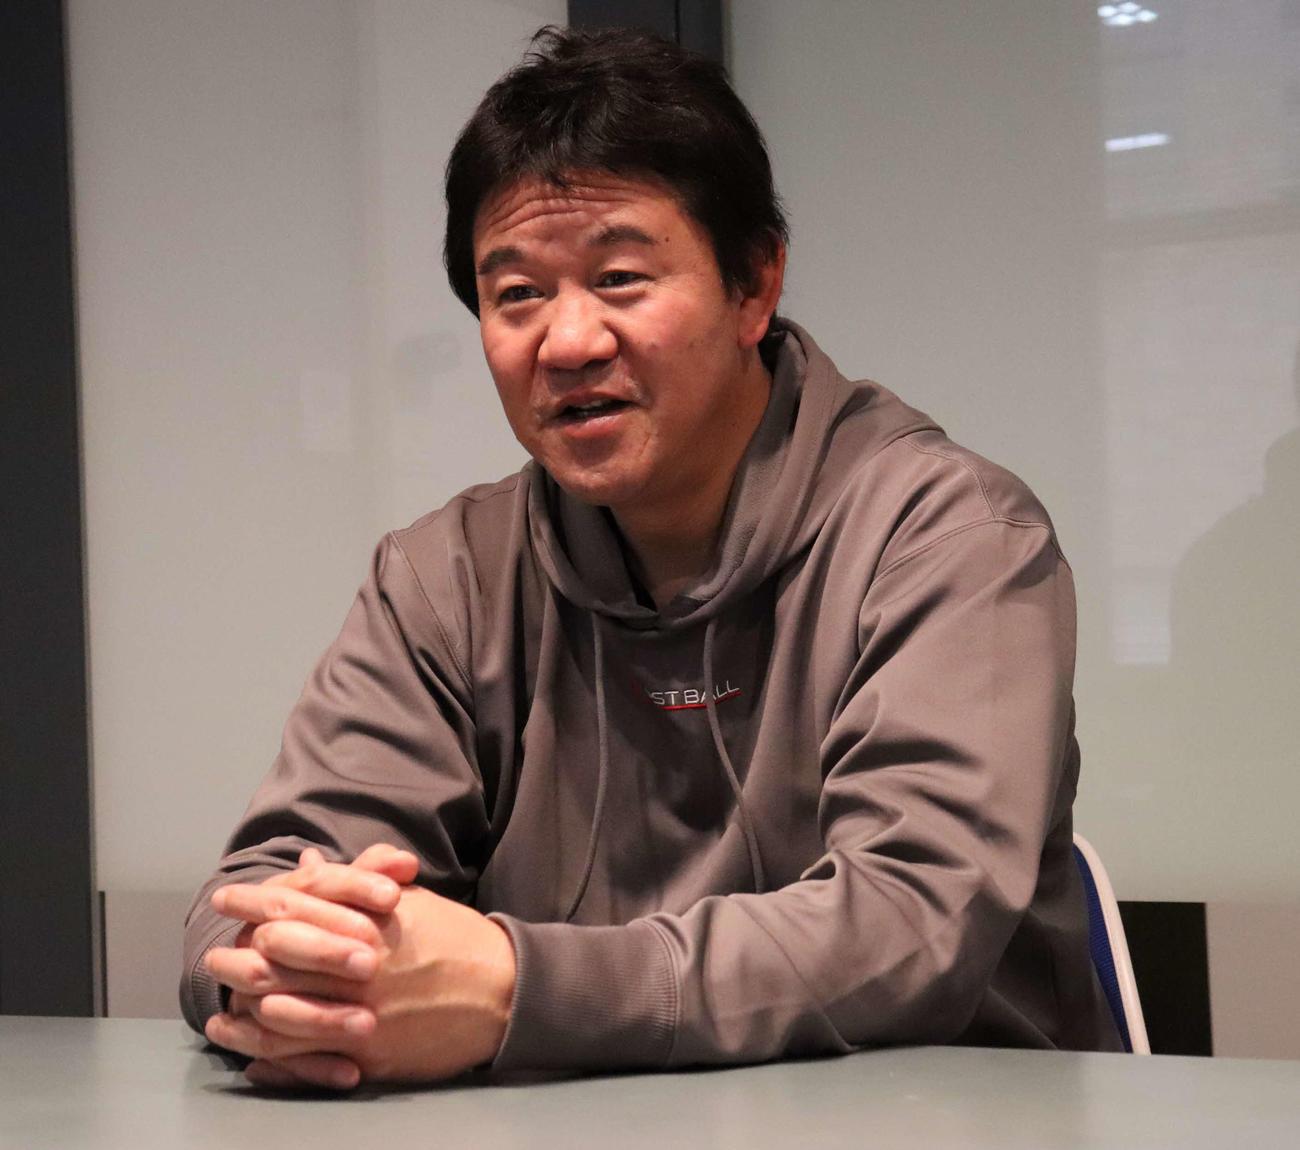 BCリーグに新規参入し、シーズンの意気込みを語るBC神奈川・鈴木尚典監督(撮影・湯本勝大)